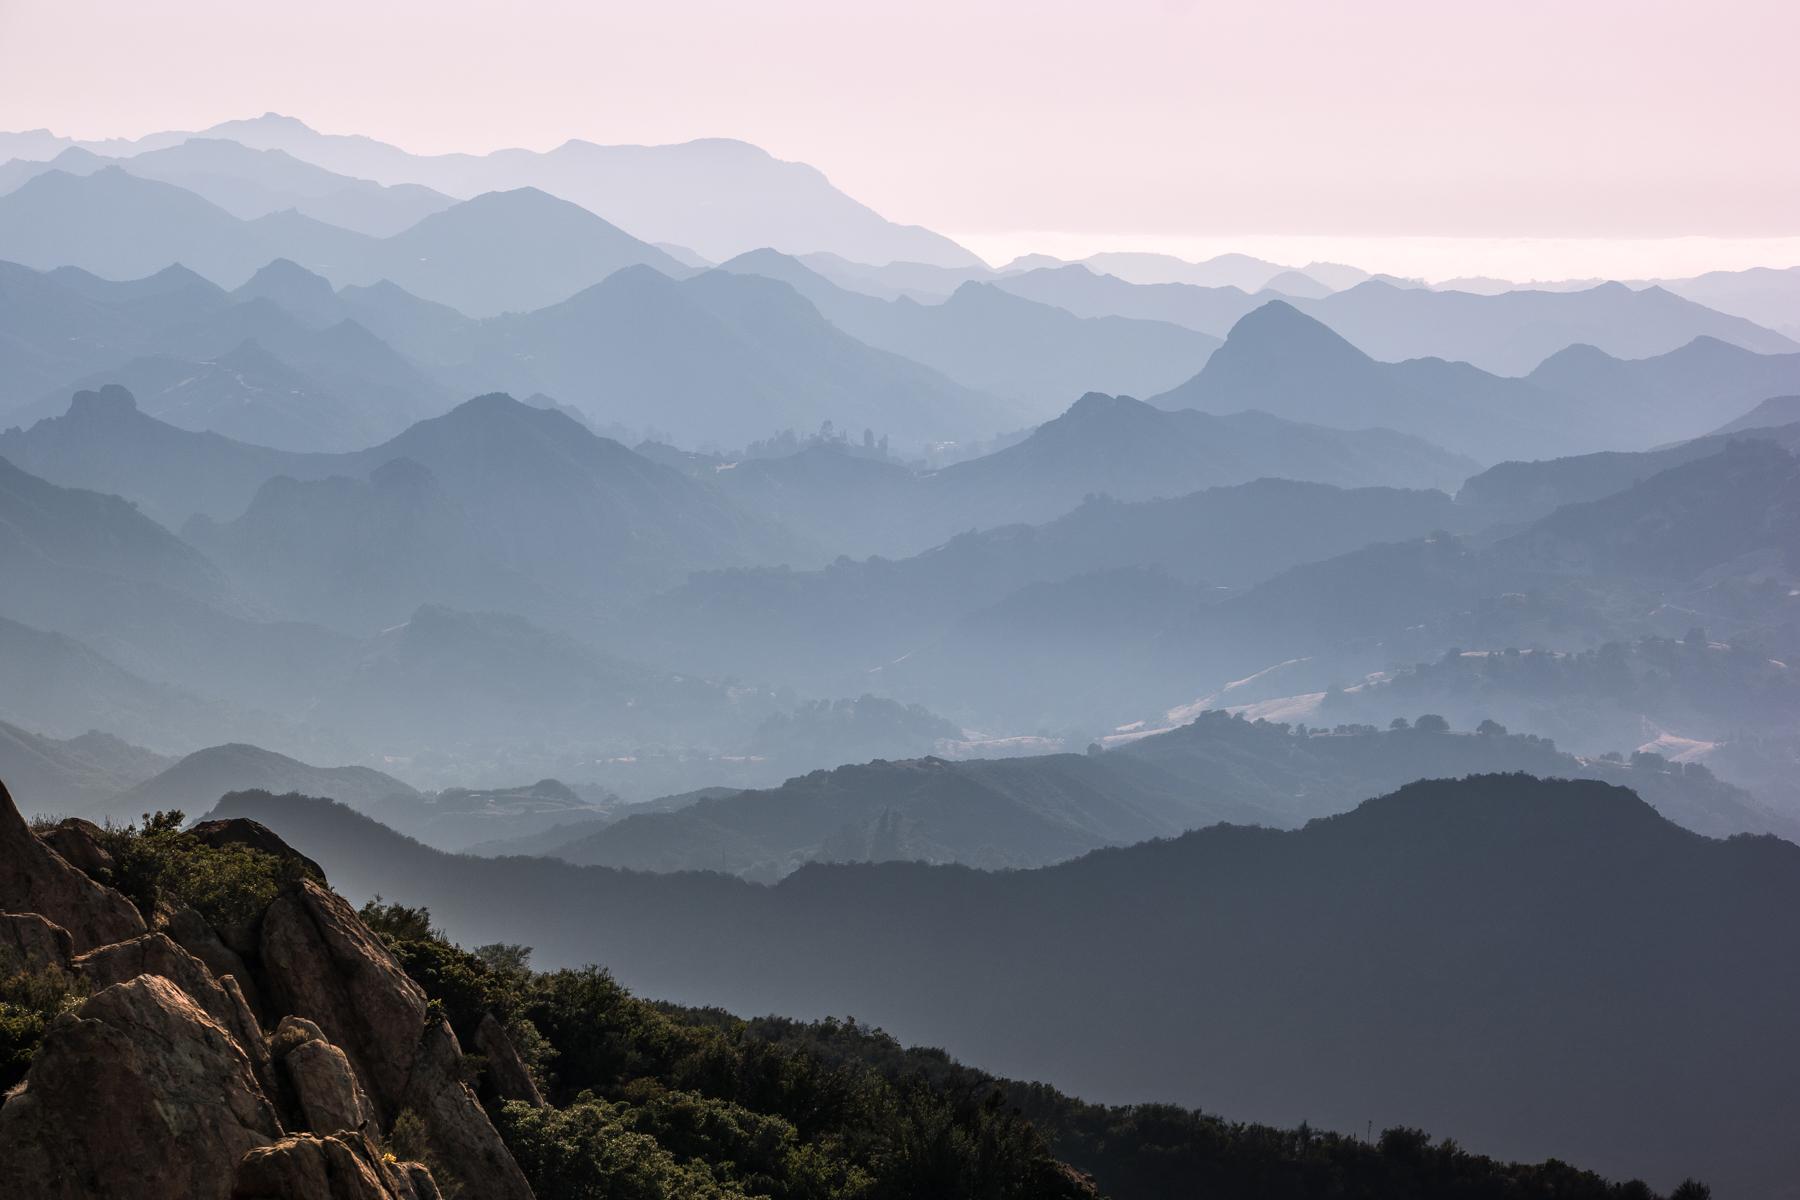 Wasim Muklashy Photography_Pacific Ocean_Sunset_Santa Monica Mountains_California_Samsung NX1_ SAM_4221_1800px.jpg